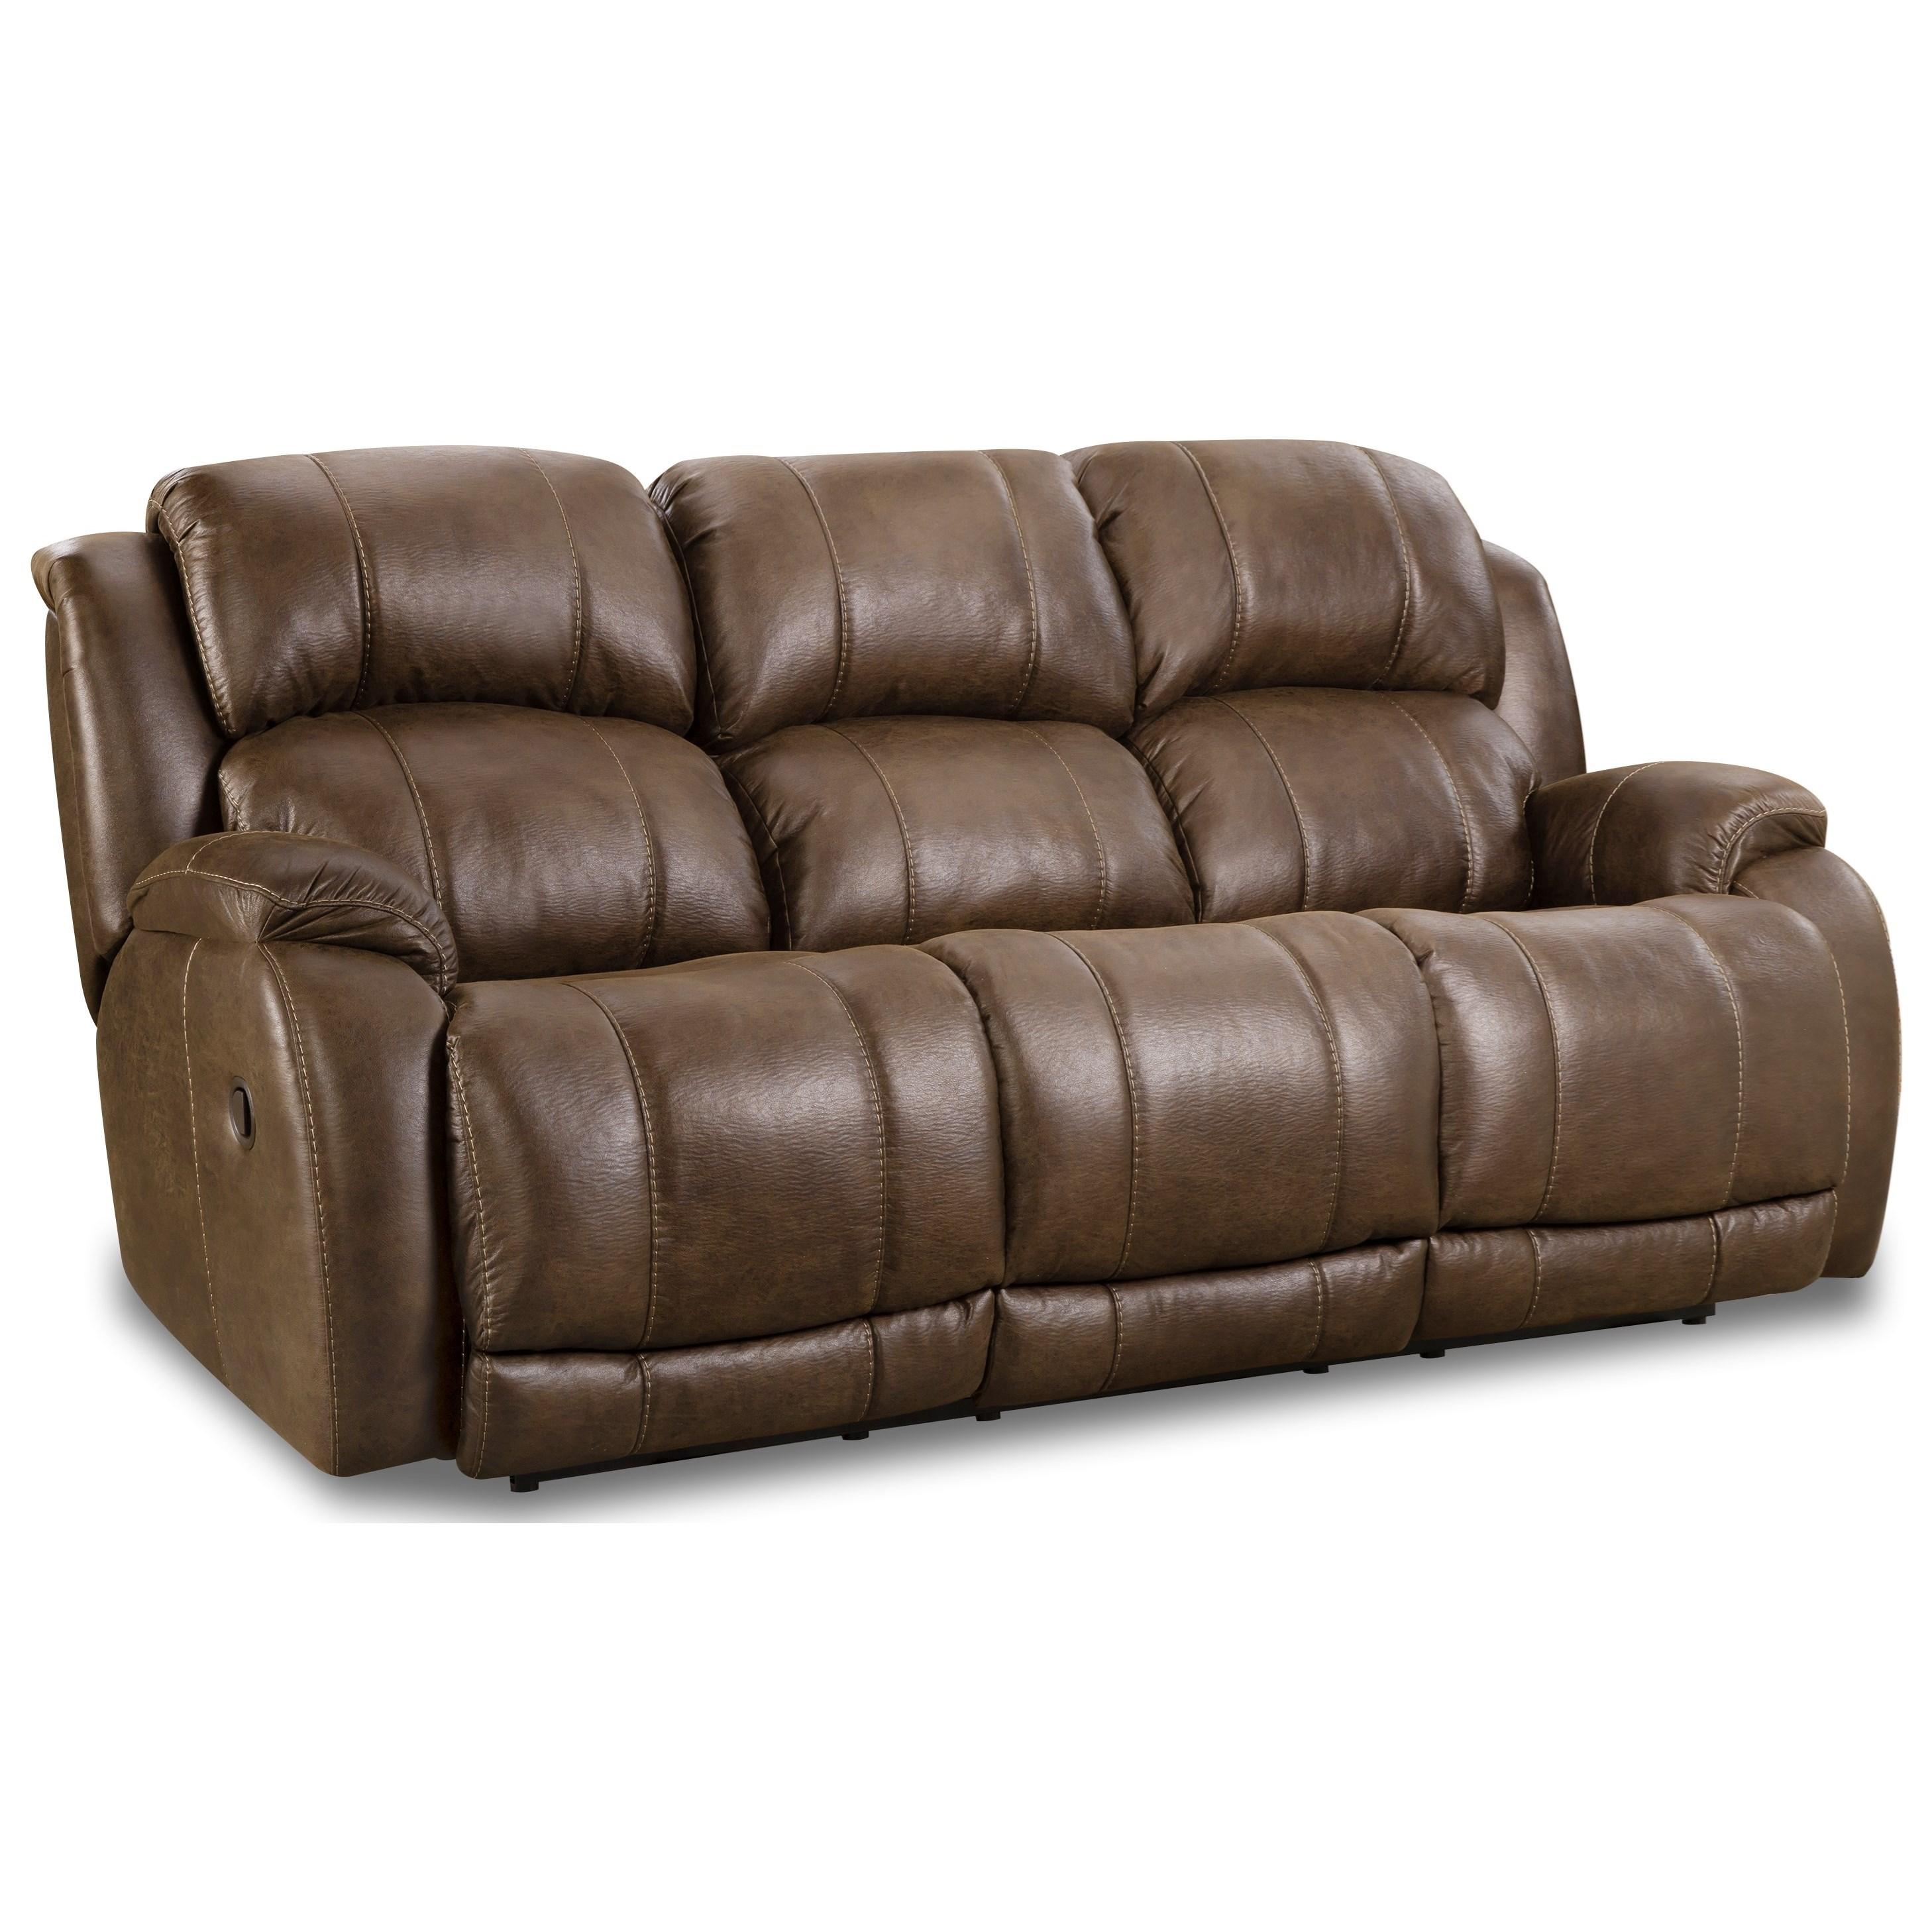 Casual Dual Power Reclining Sofa